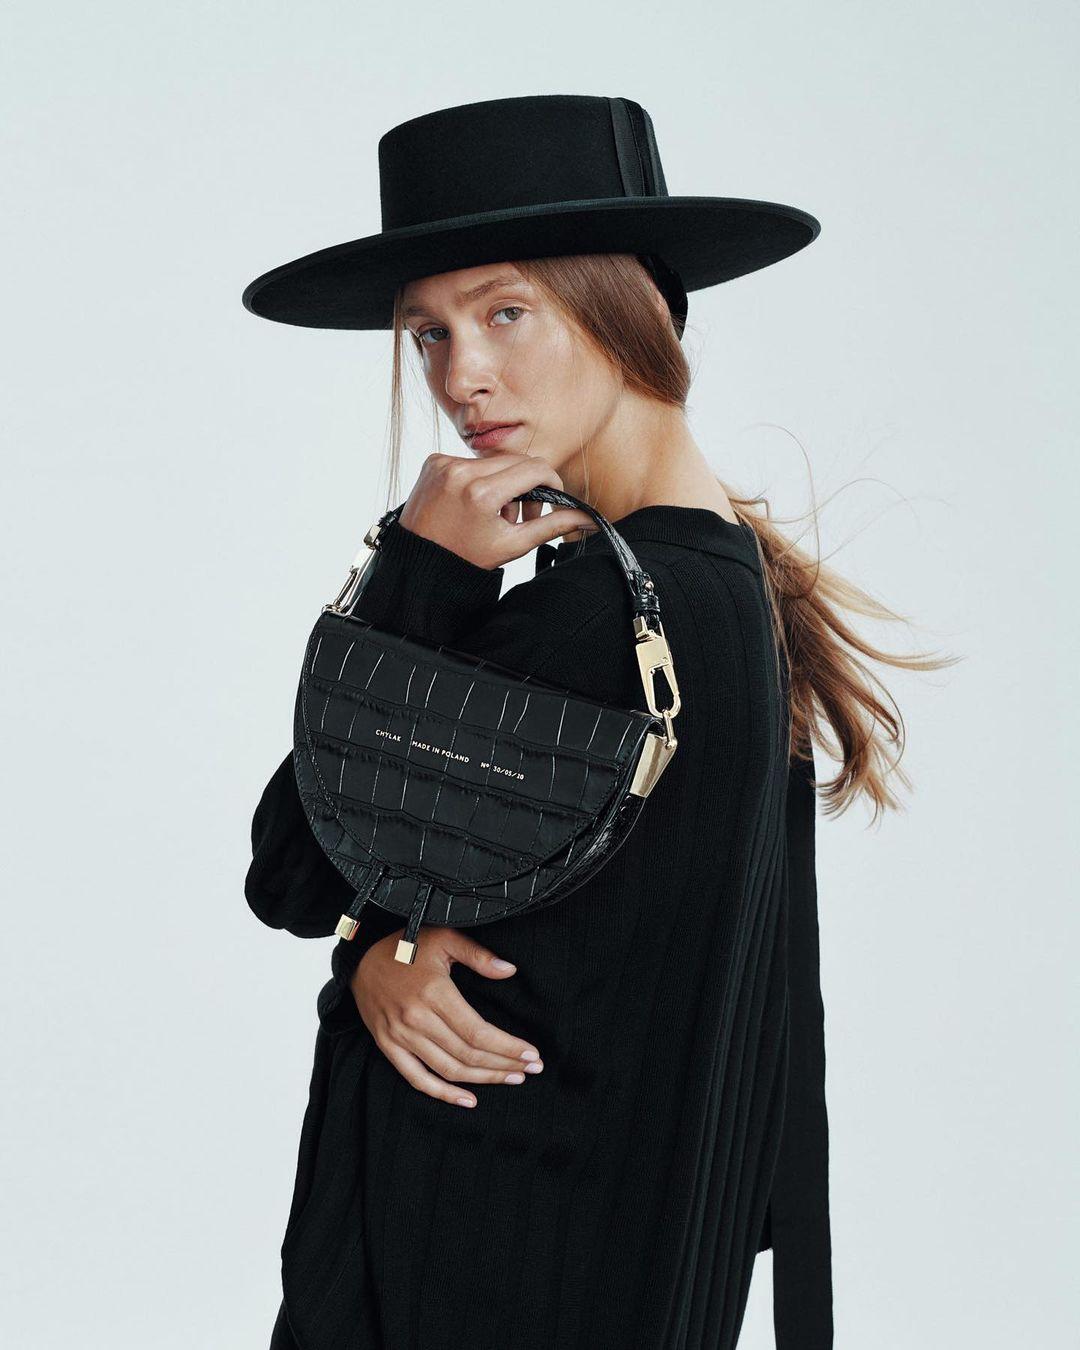 Everyday Handbag  Essentials for the Girl  Always on the Go  ...